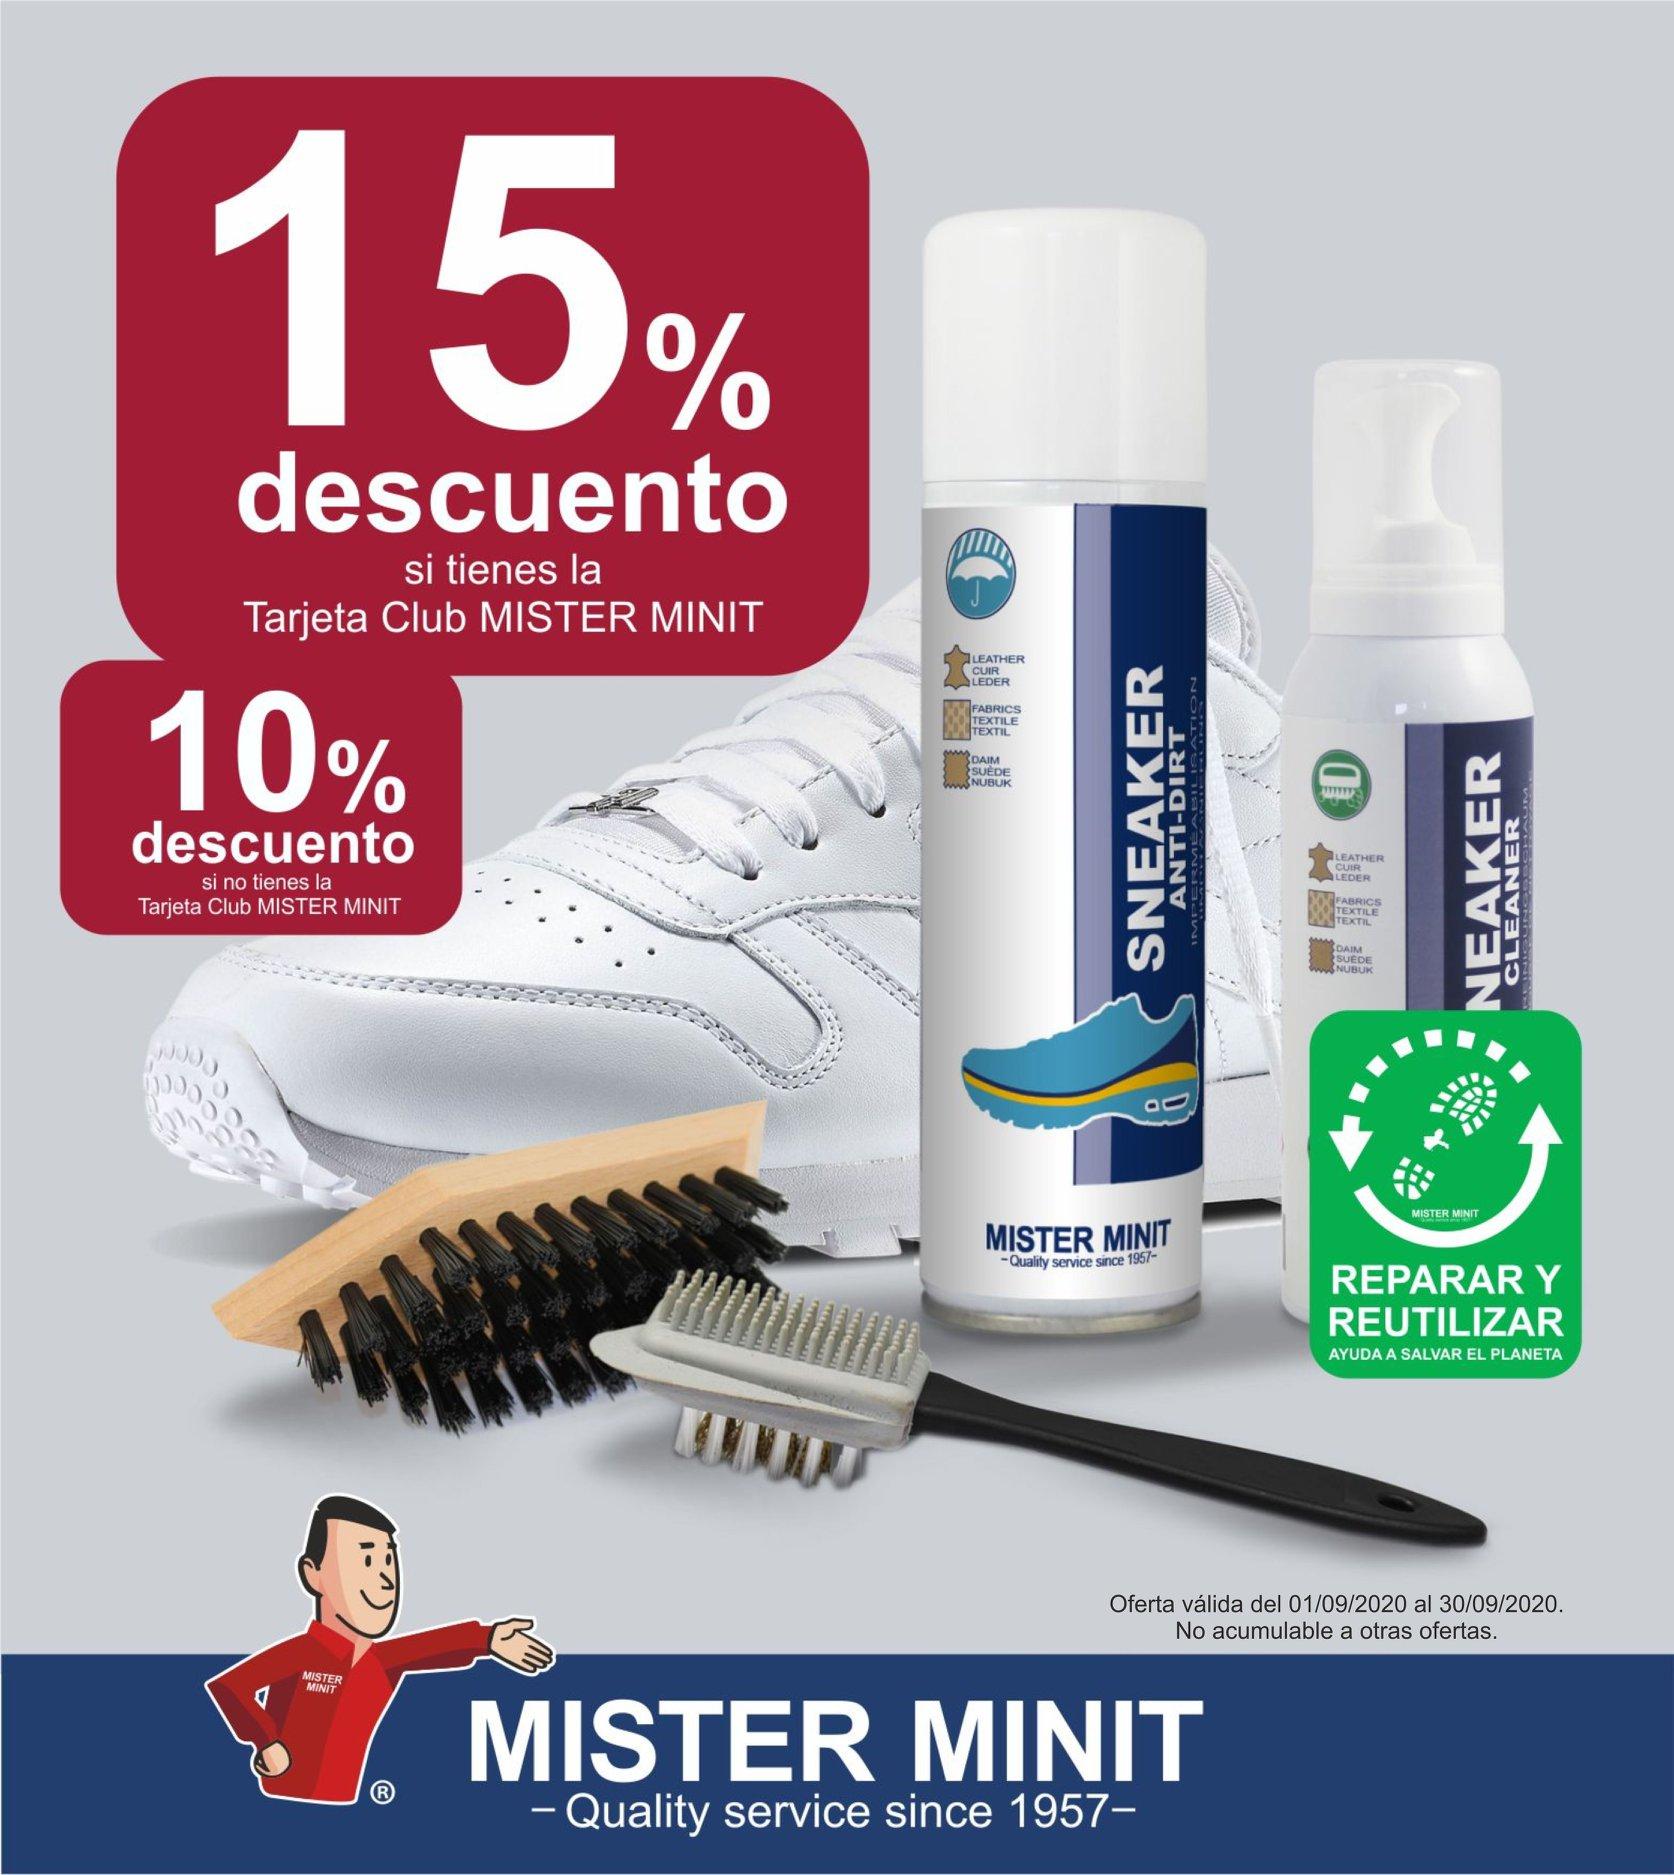 Calzado limpio con Mister Minit